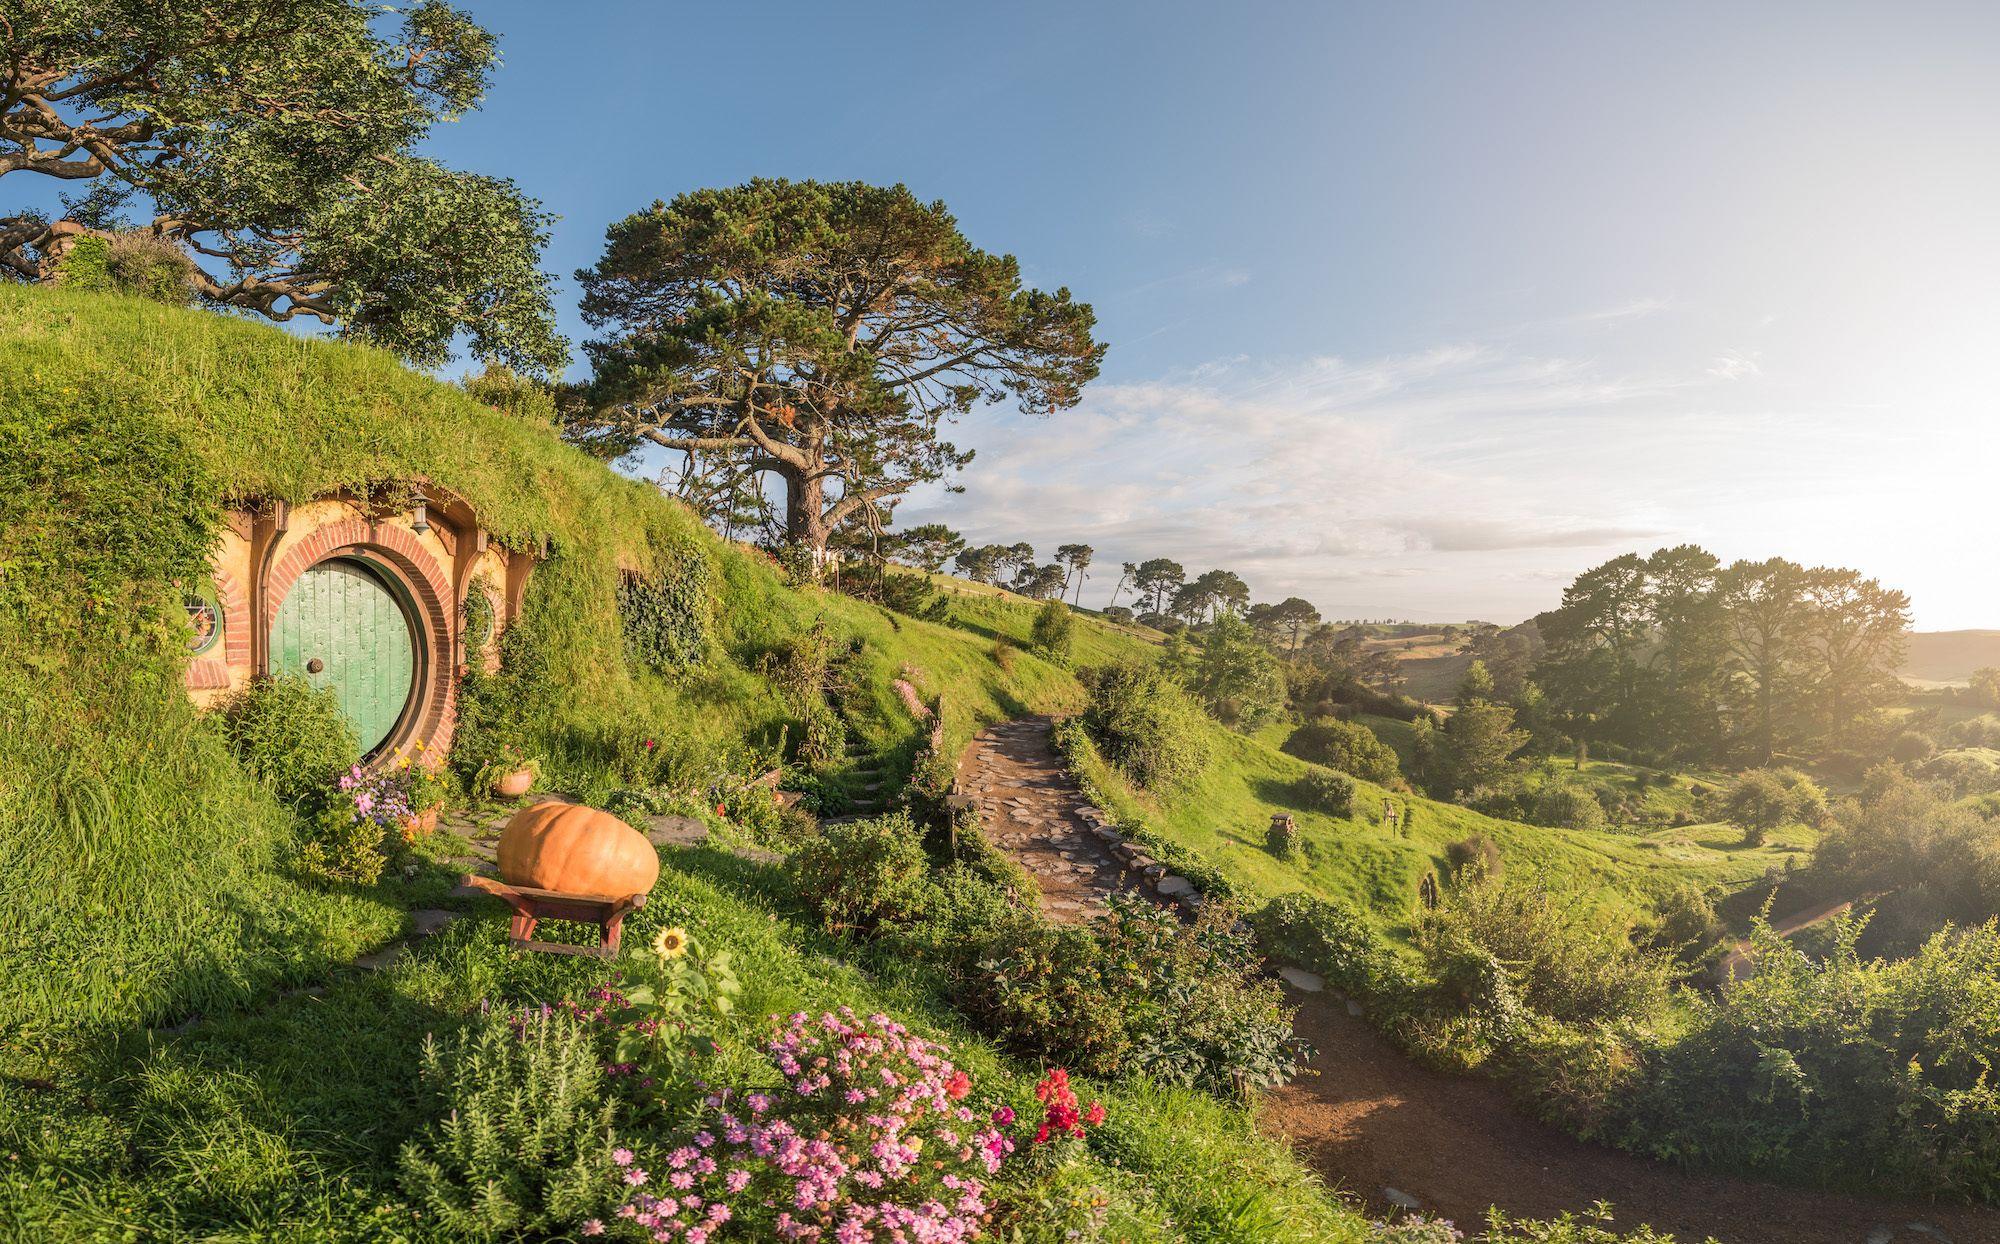 Hobbiton Film Set Tour departing Matamata i-SITE